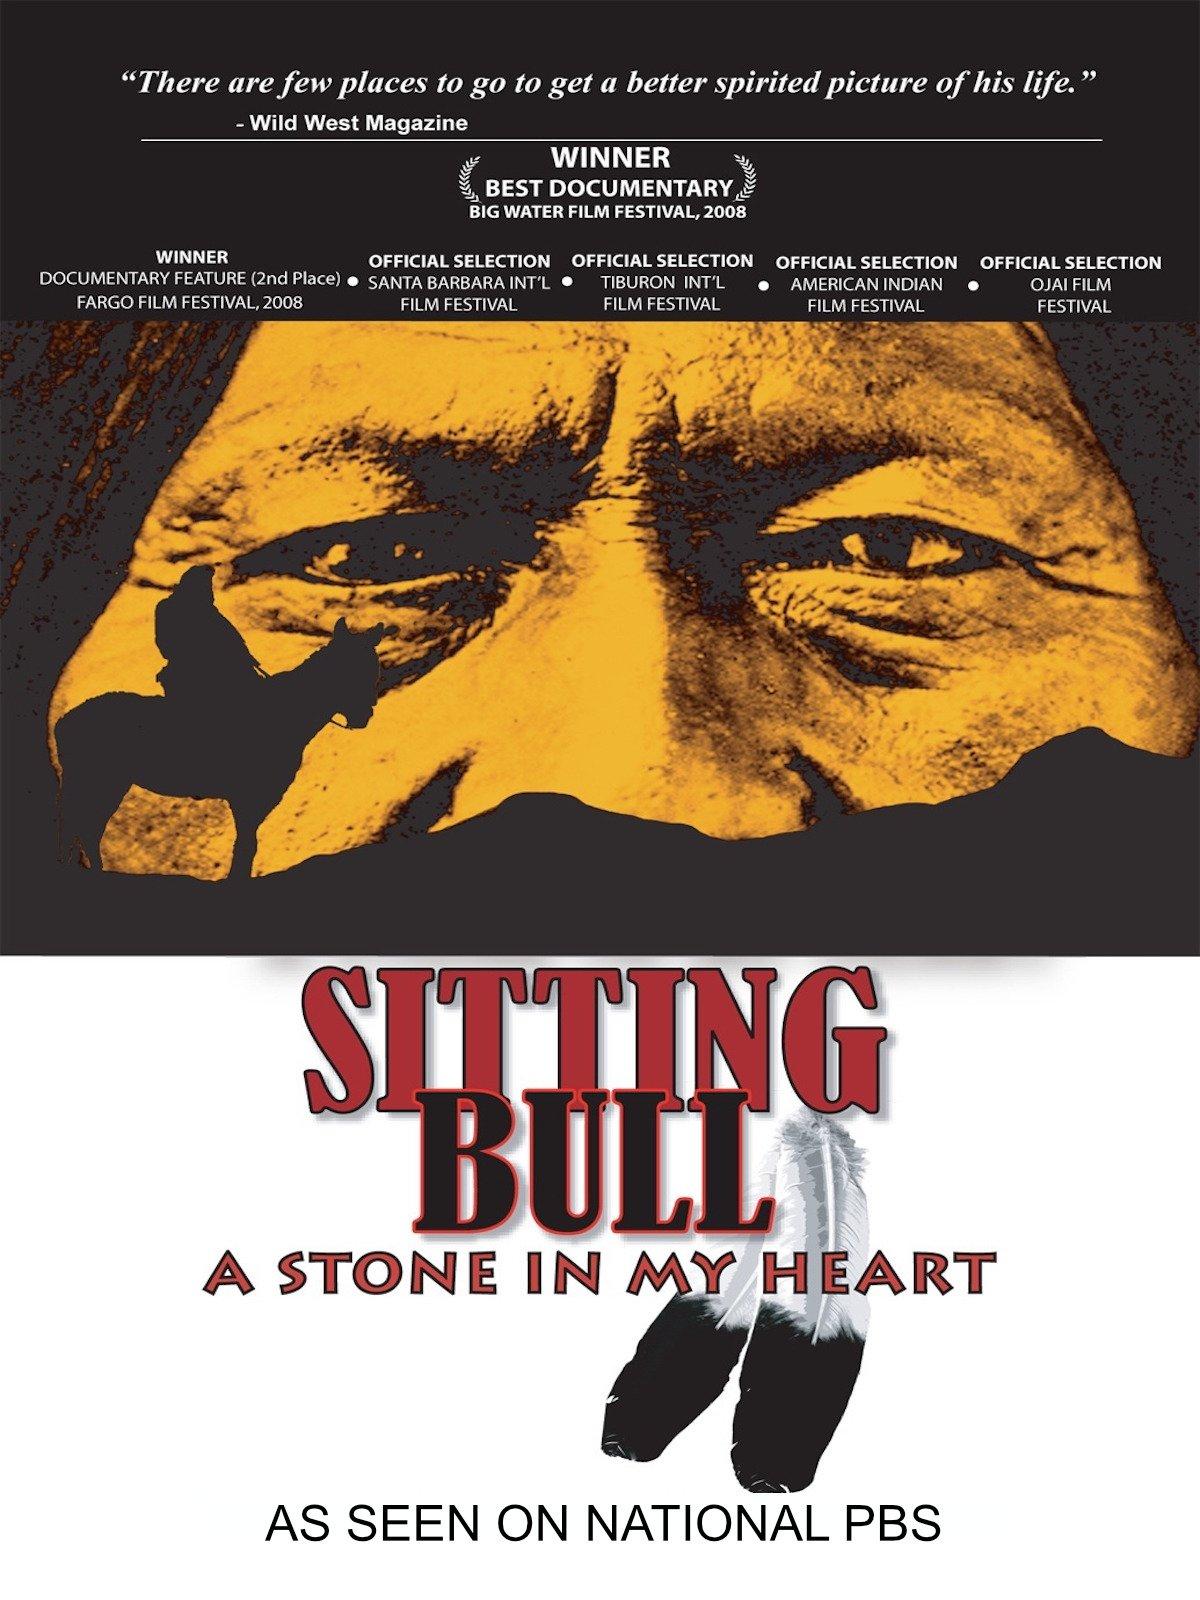 Sitting Bull: A Stone in My Heart